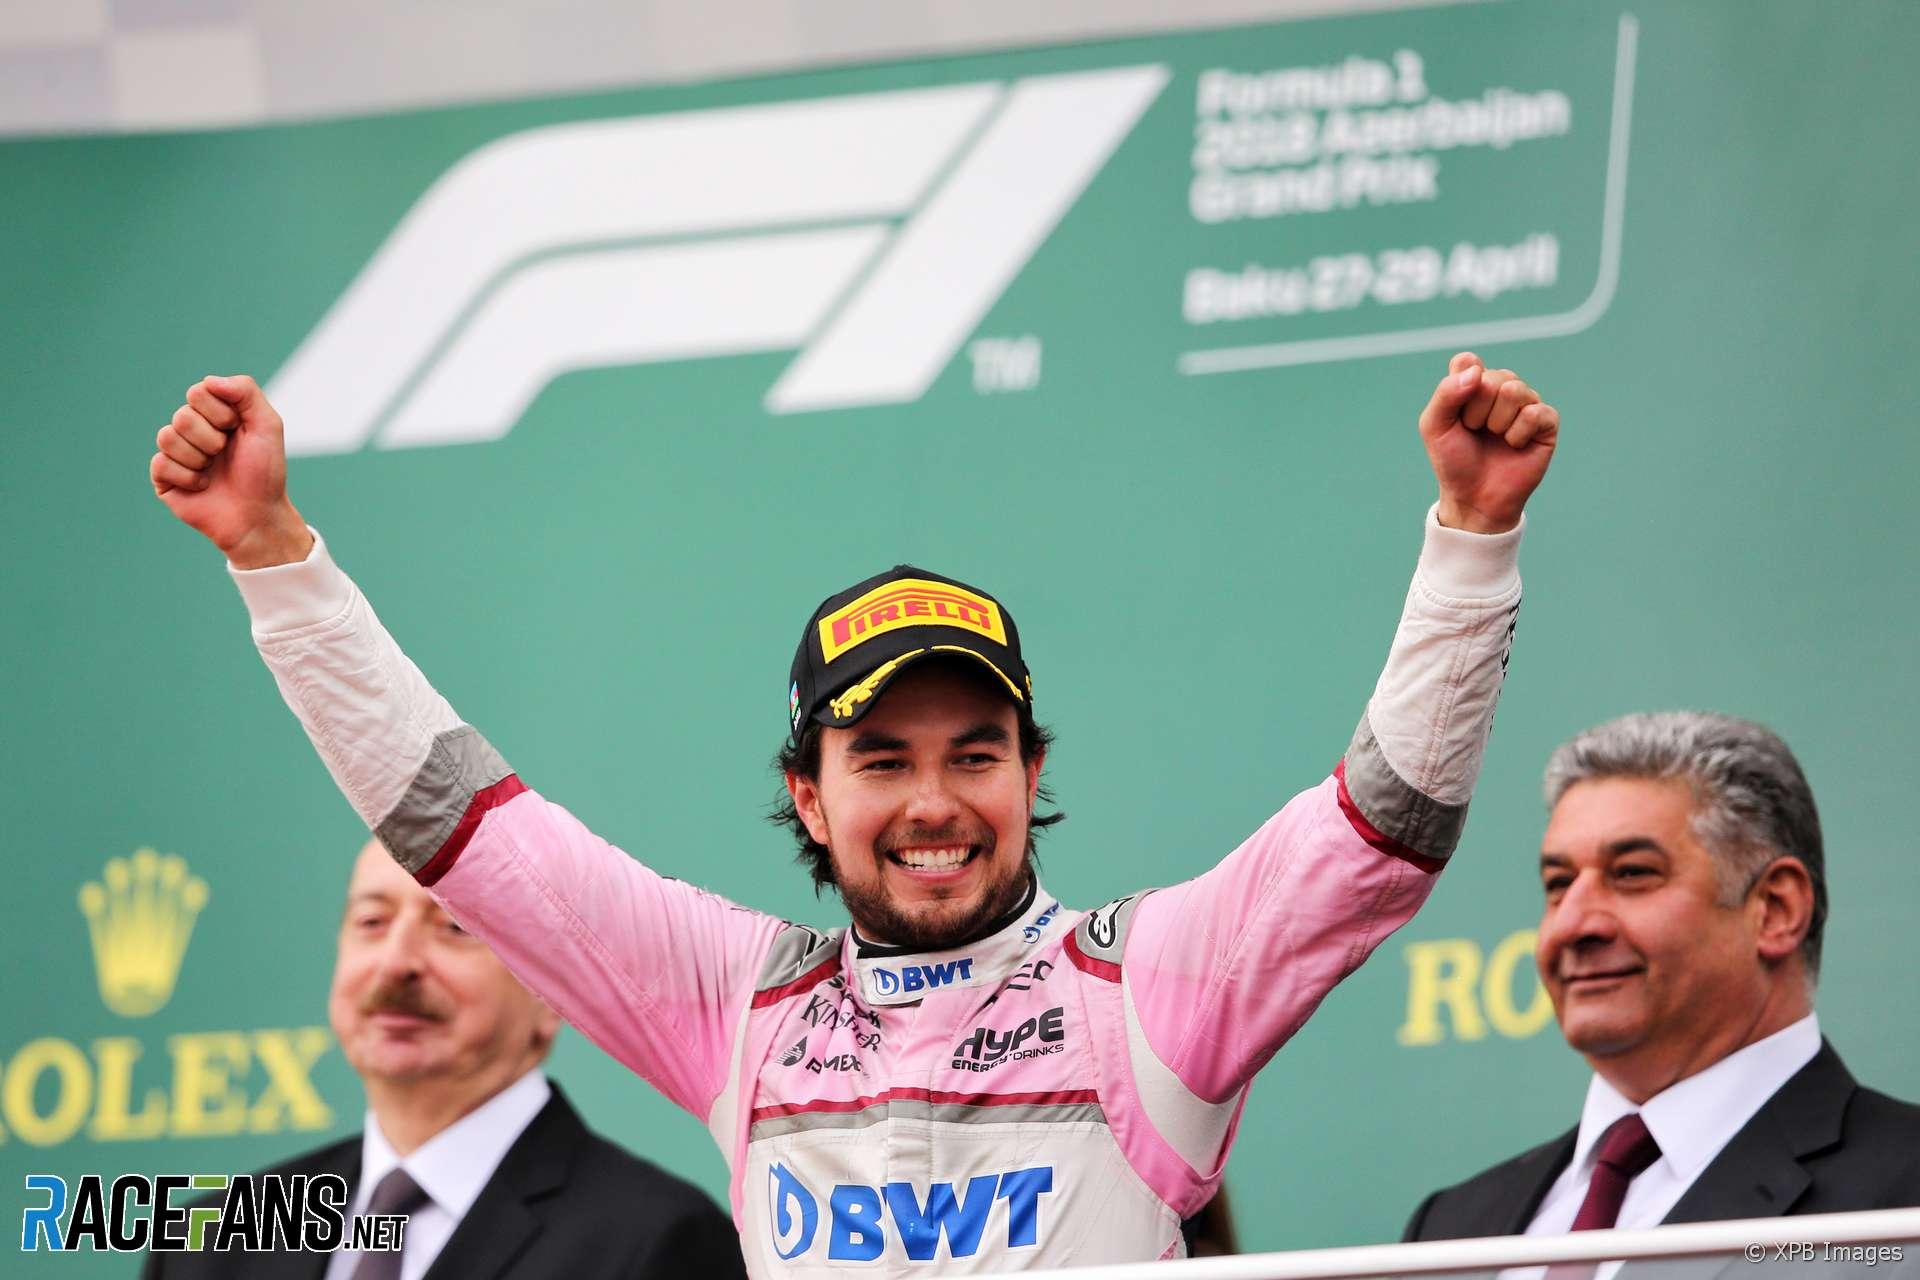 Sergio Perez, Force India, Baku City Circuit, 2018